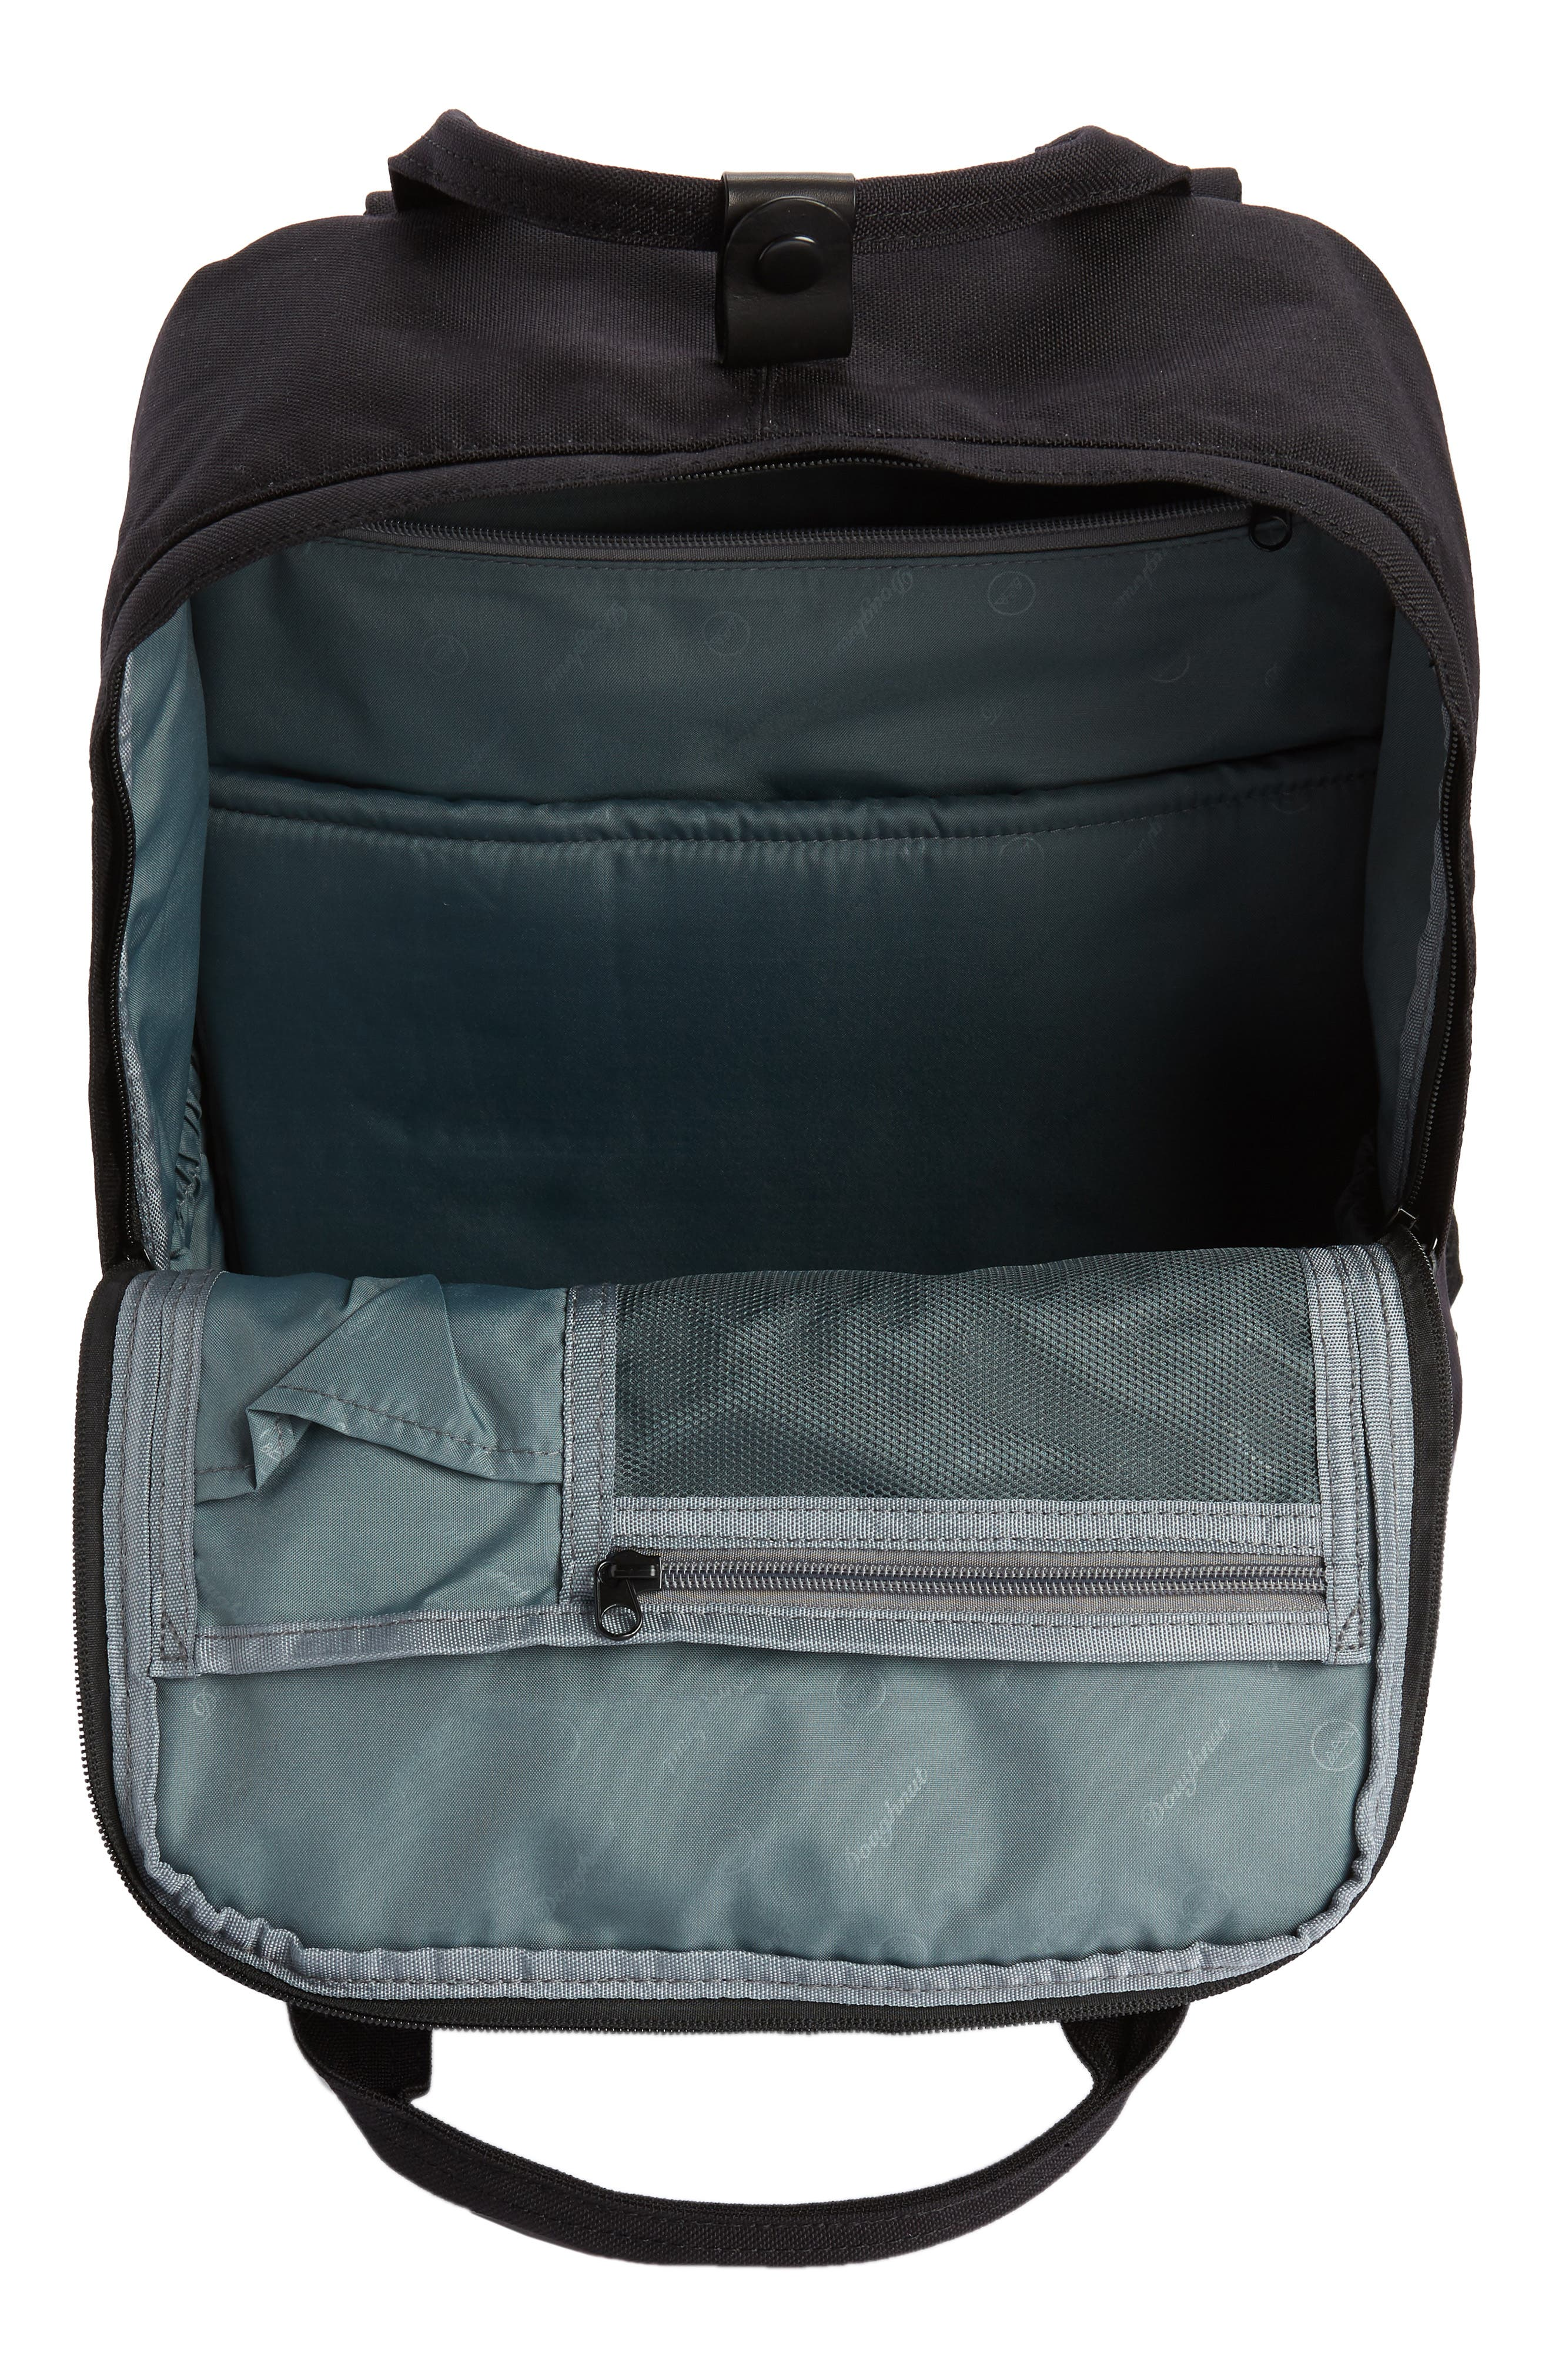 Macaroon Large Cordura<sup>®</sup> Black Series Water Repellent Backpack,                             Alternate thumbnail 4, color,                             Black